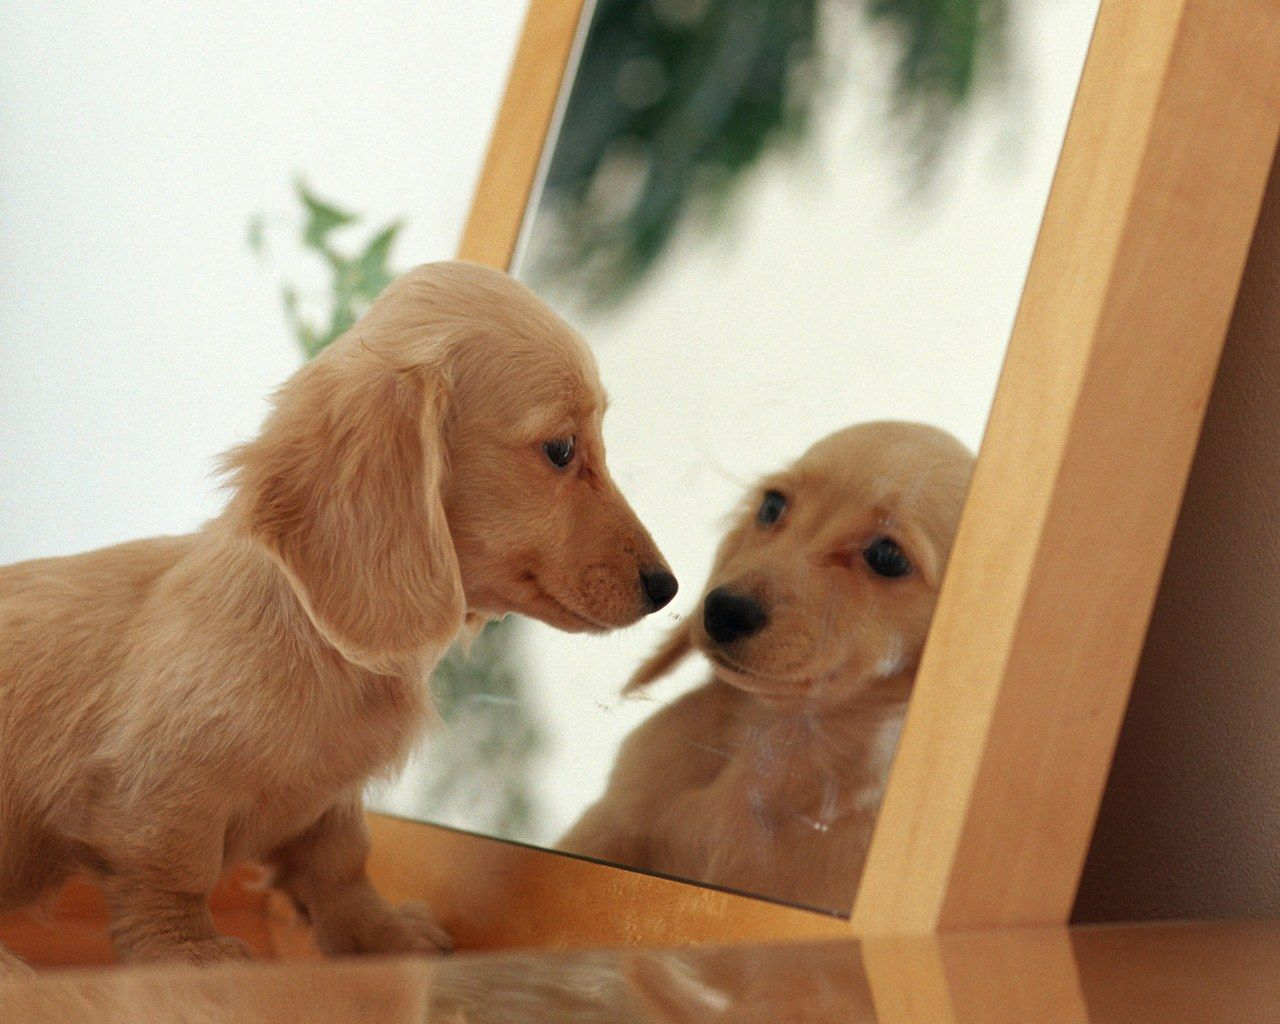 Mirror Reflection | AM THE FAIREST !, Dachshund, Lovely, mirror, Puppy, reflection